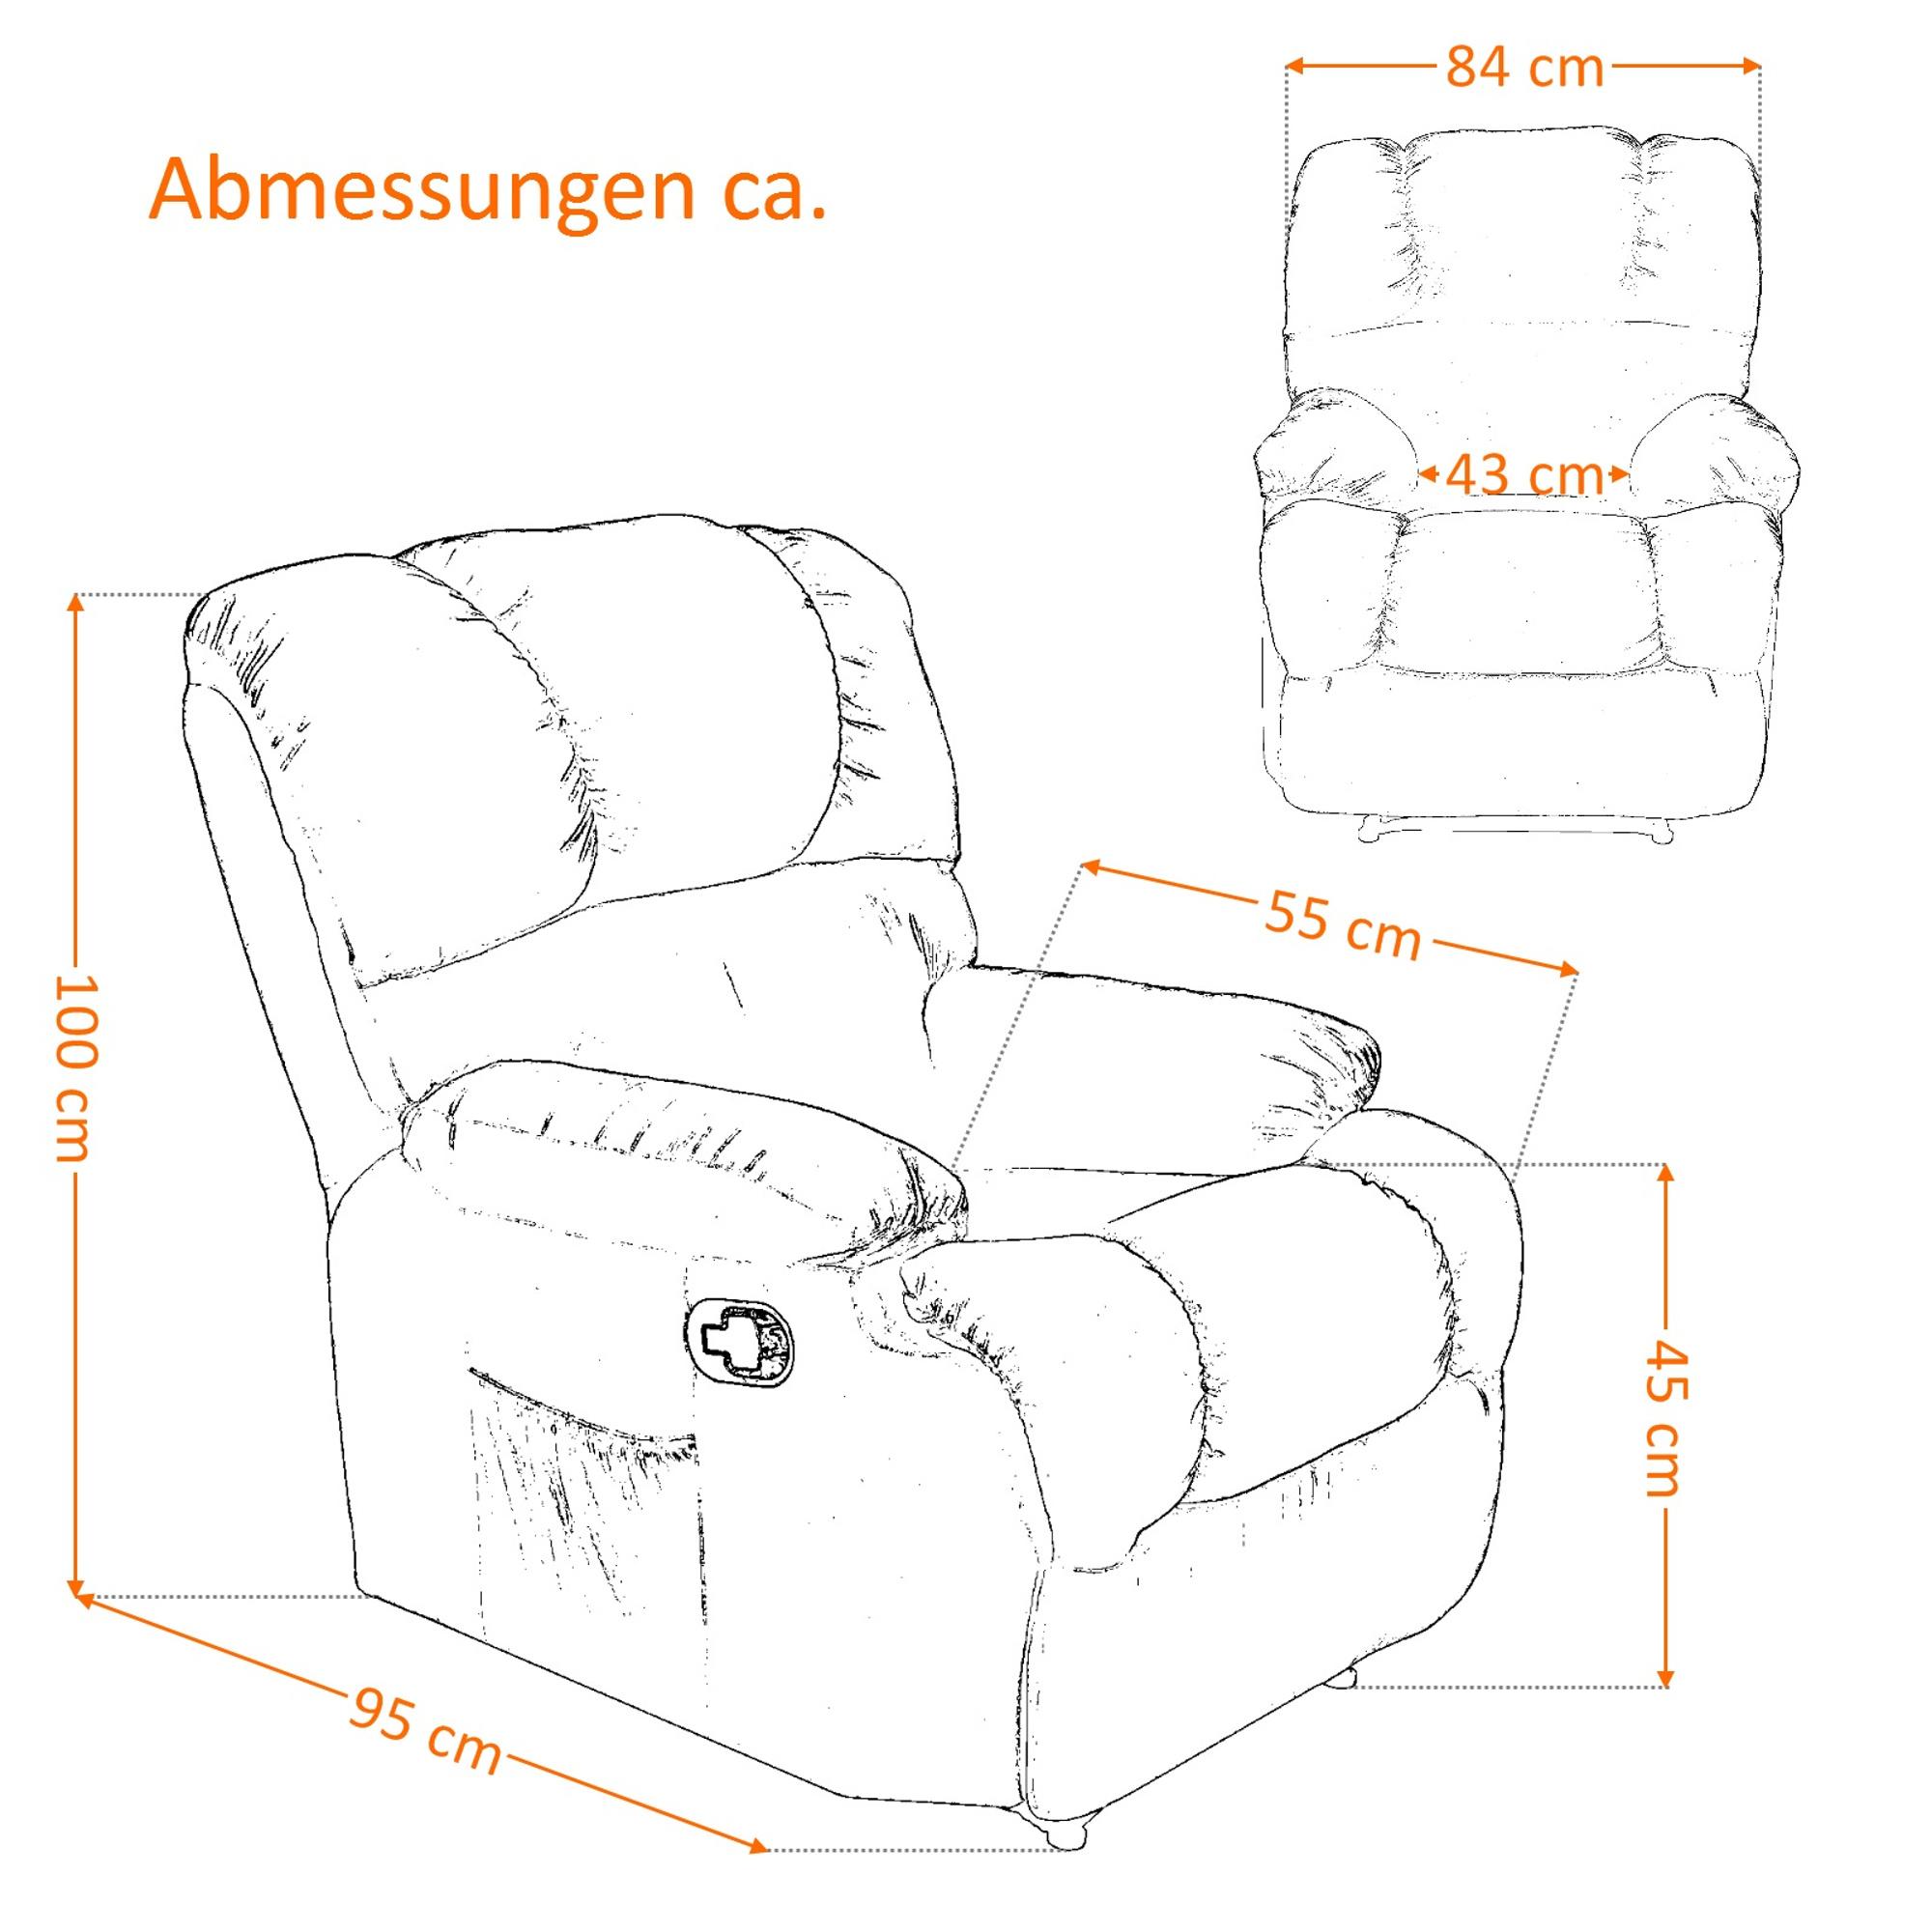 Full Size of Fernsehsessel Aus Stoff 2er Sofa Grau Microfaser Wohnzimmer Kinosessel 2er Microfaser